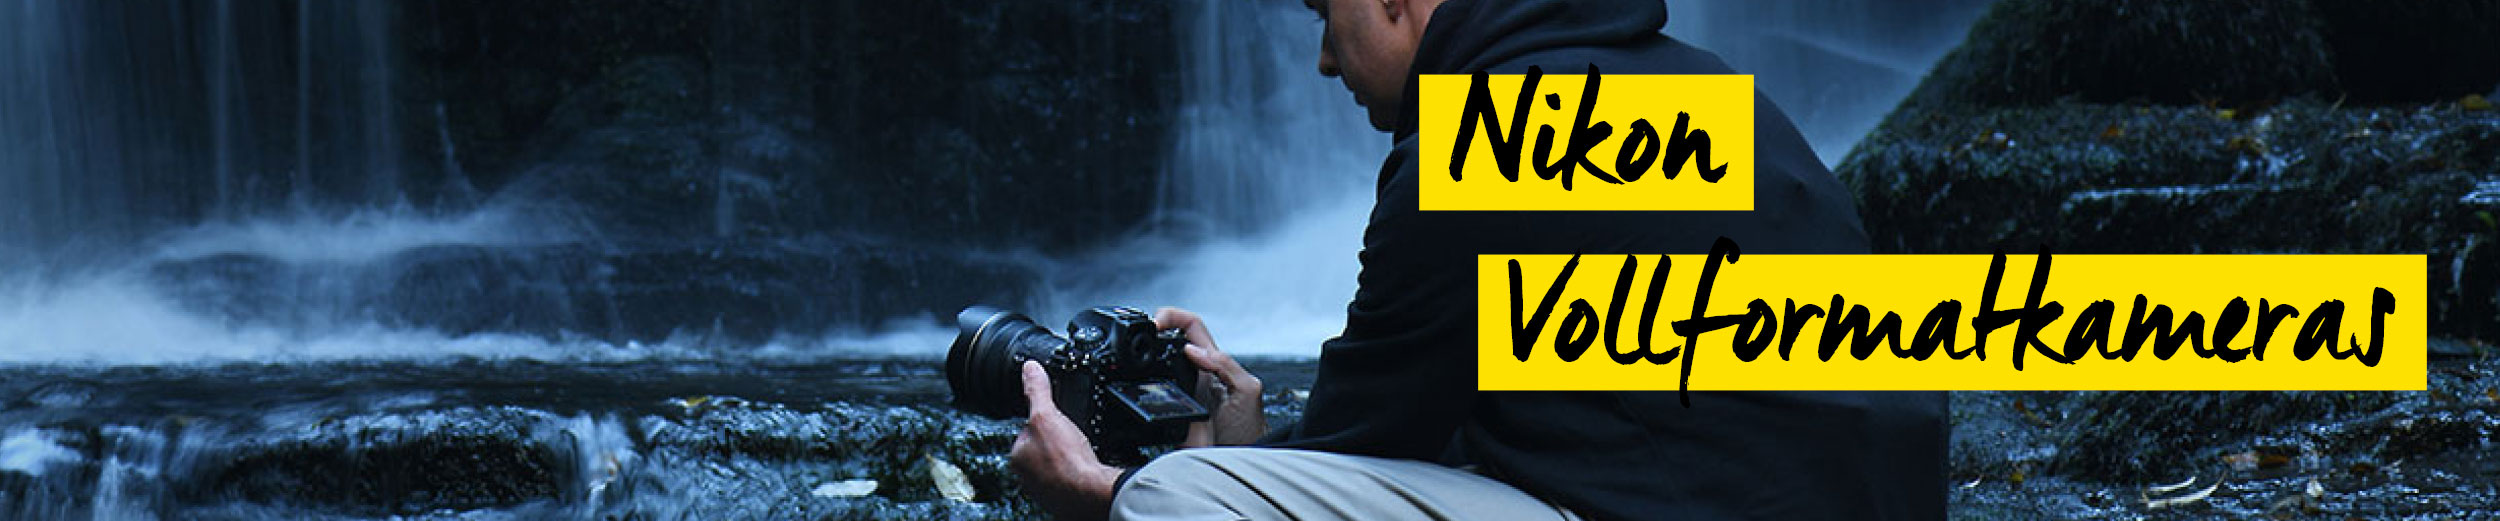 Nikon Vollformatkameras